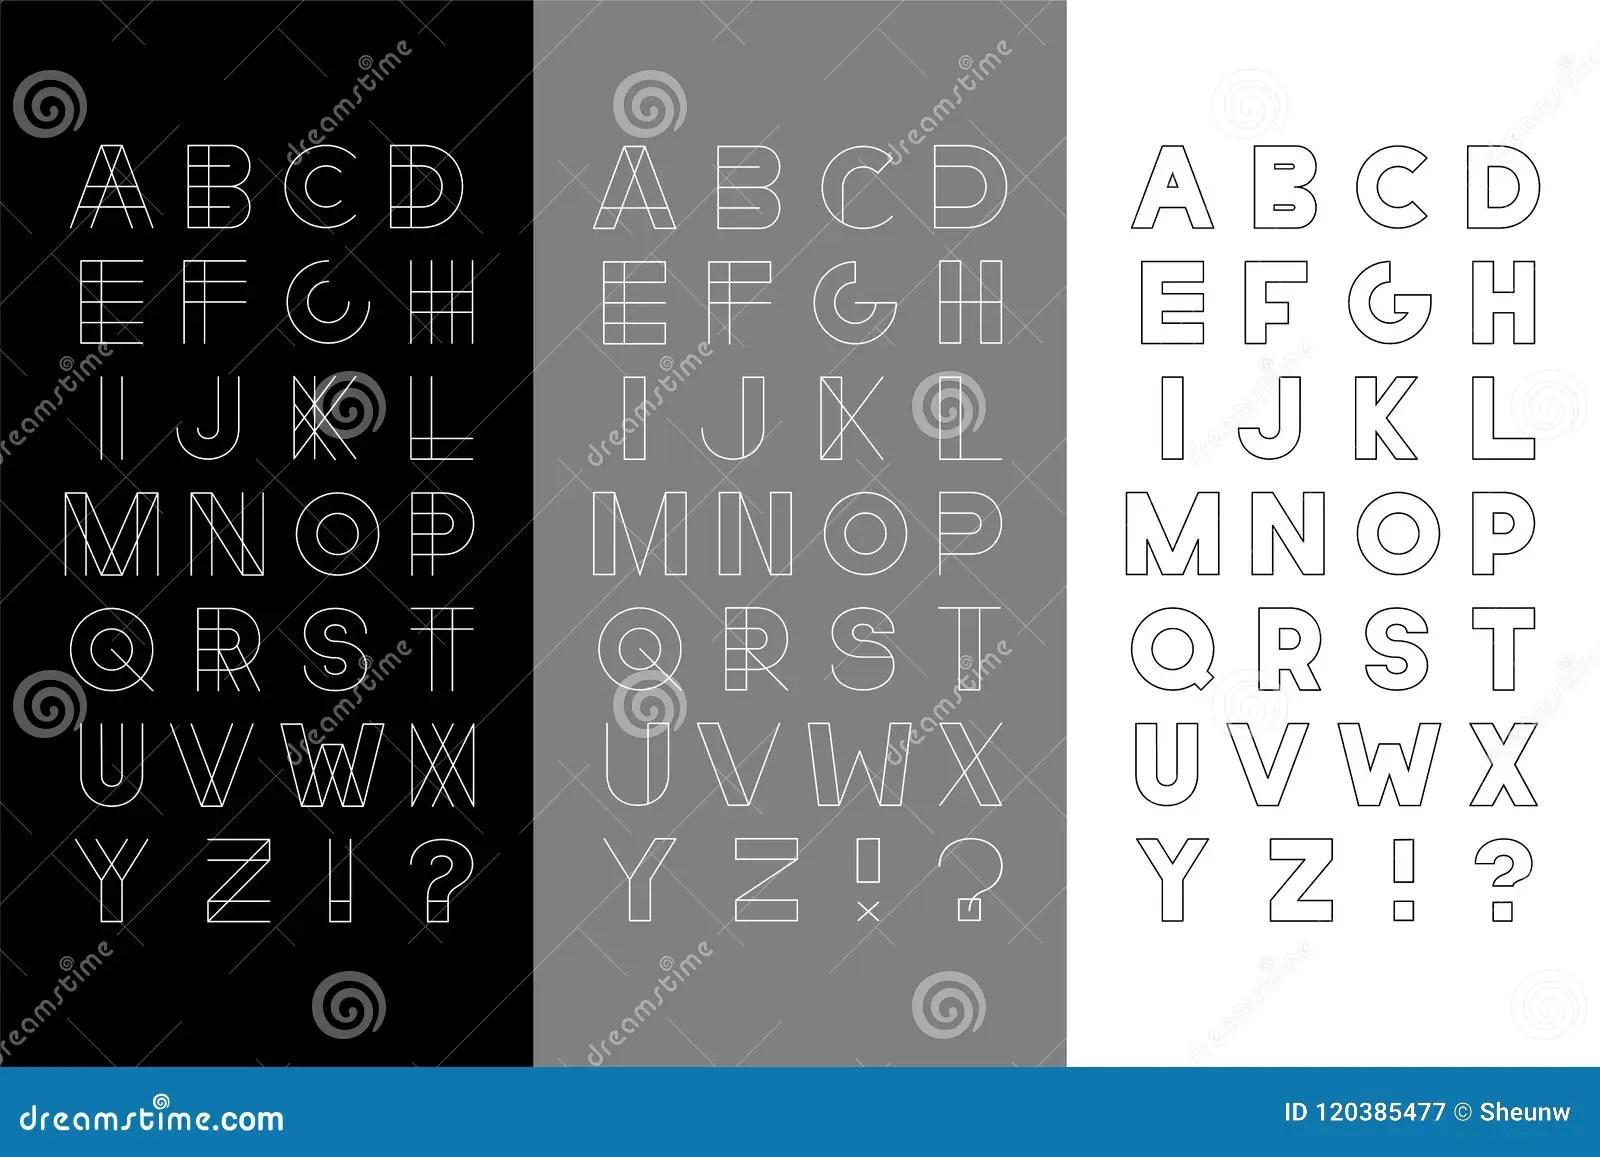 Stylish Alphabets In English